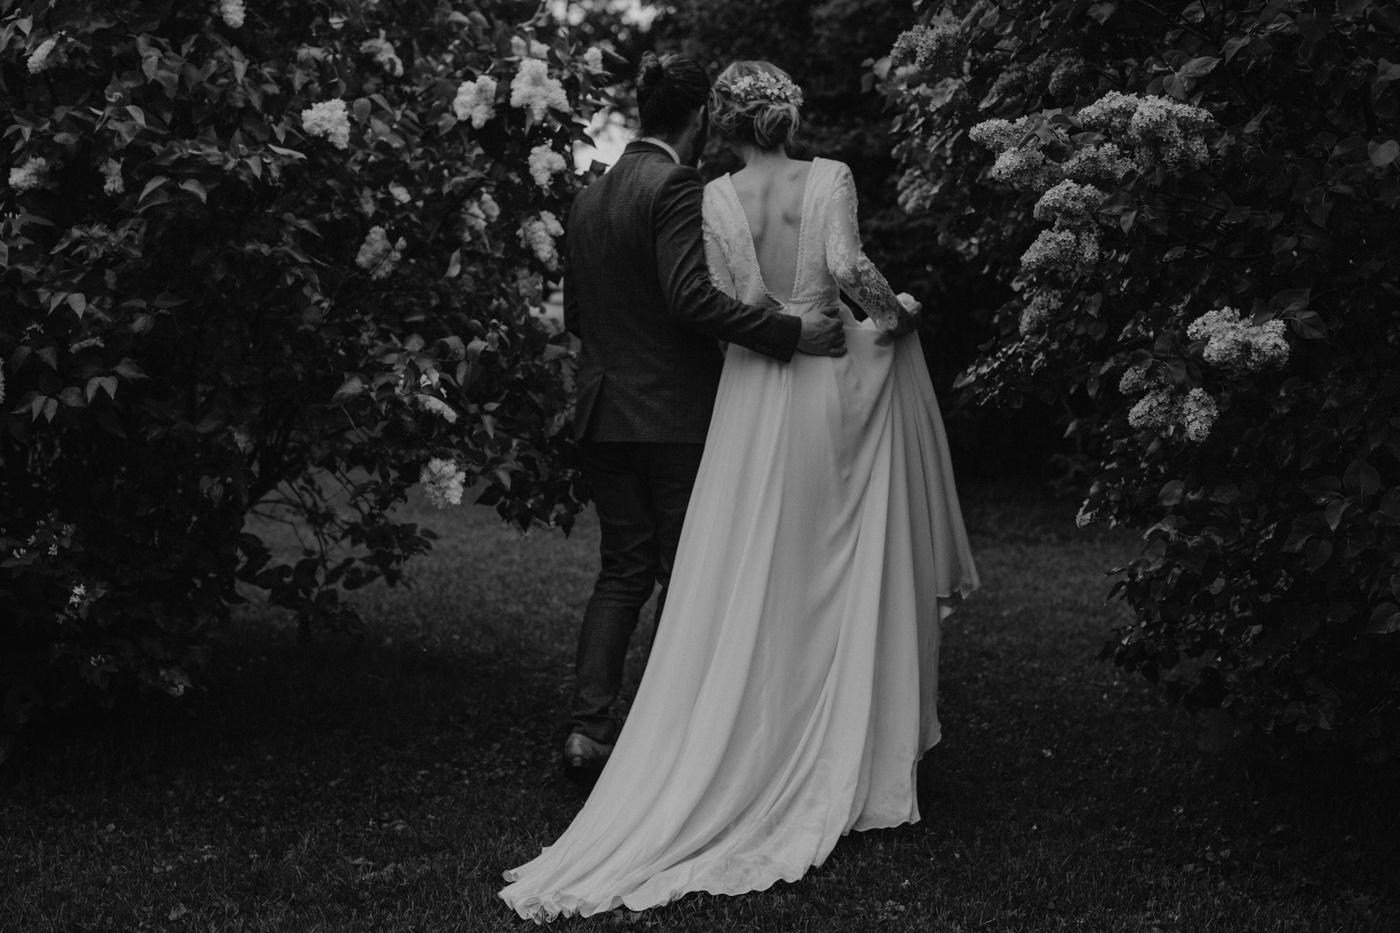 Erin-Mike-Intimate-Vintage-Wedding-Shelburne-Farms-Vermont -134.jpg